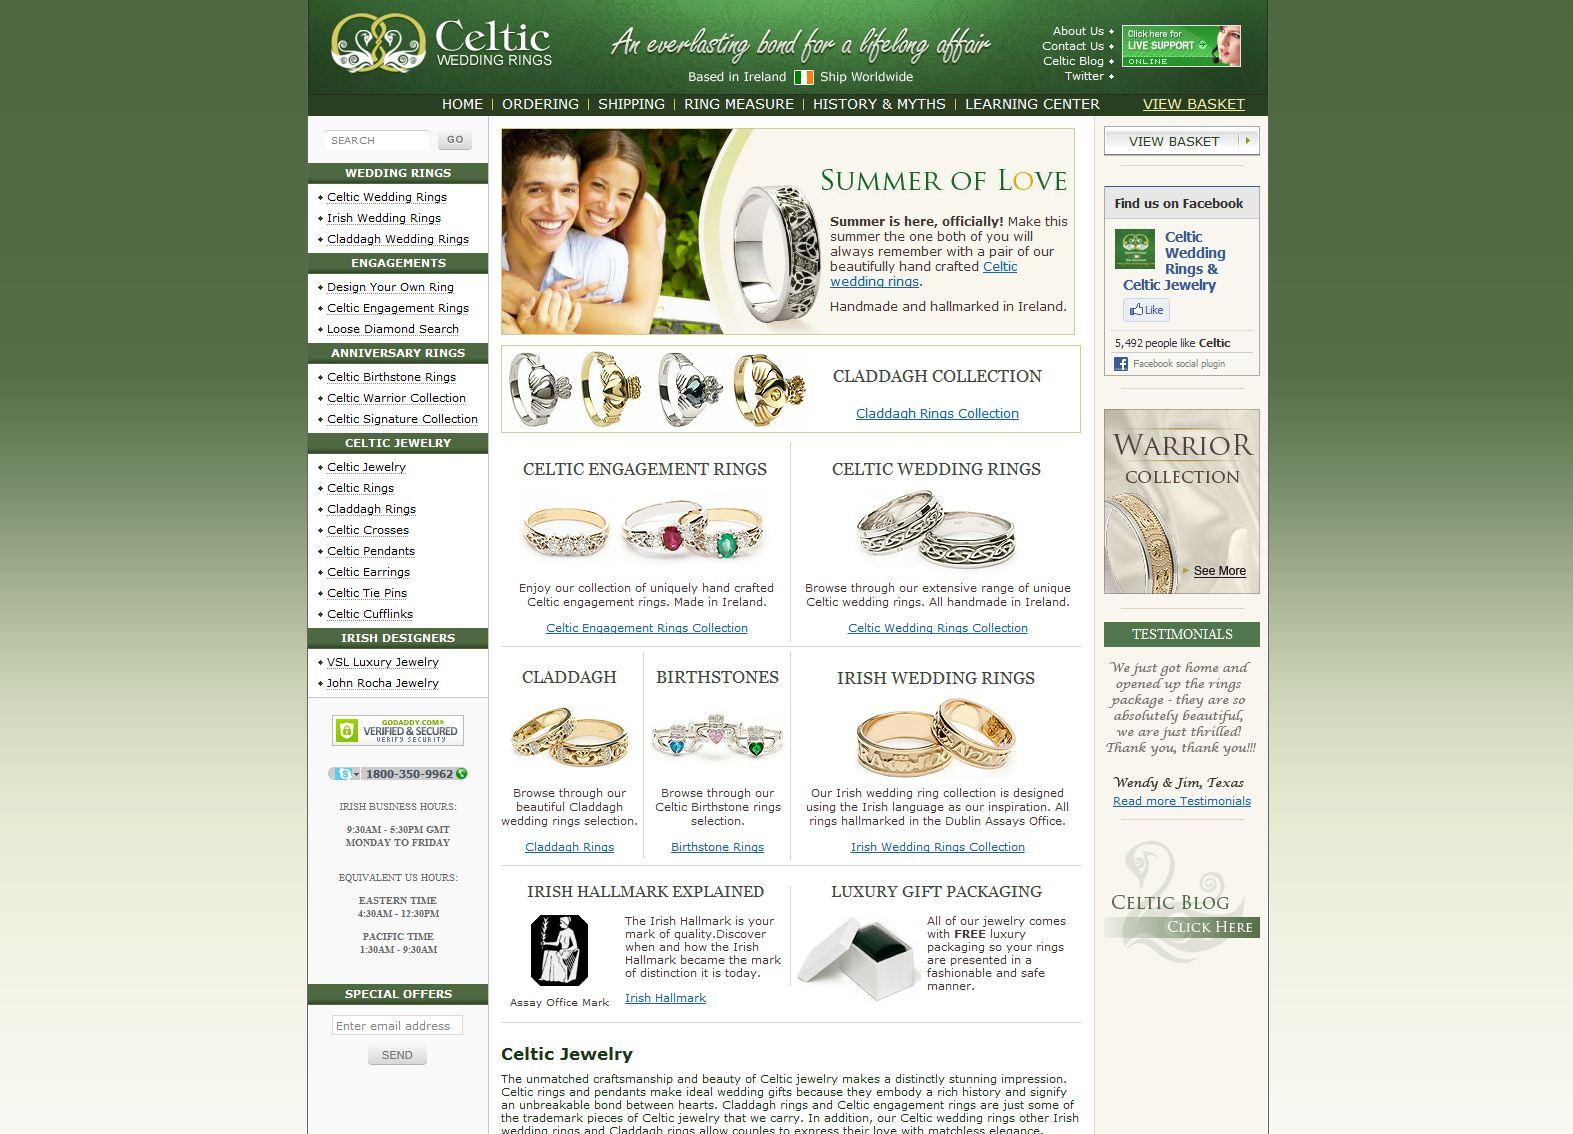 Celtic-WeddingRings.com